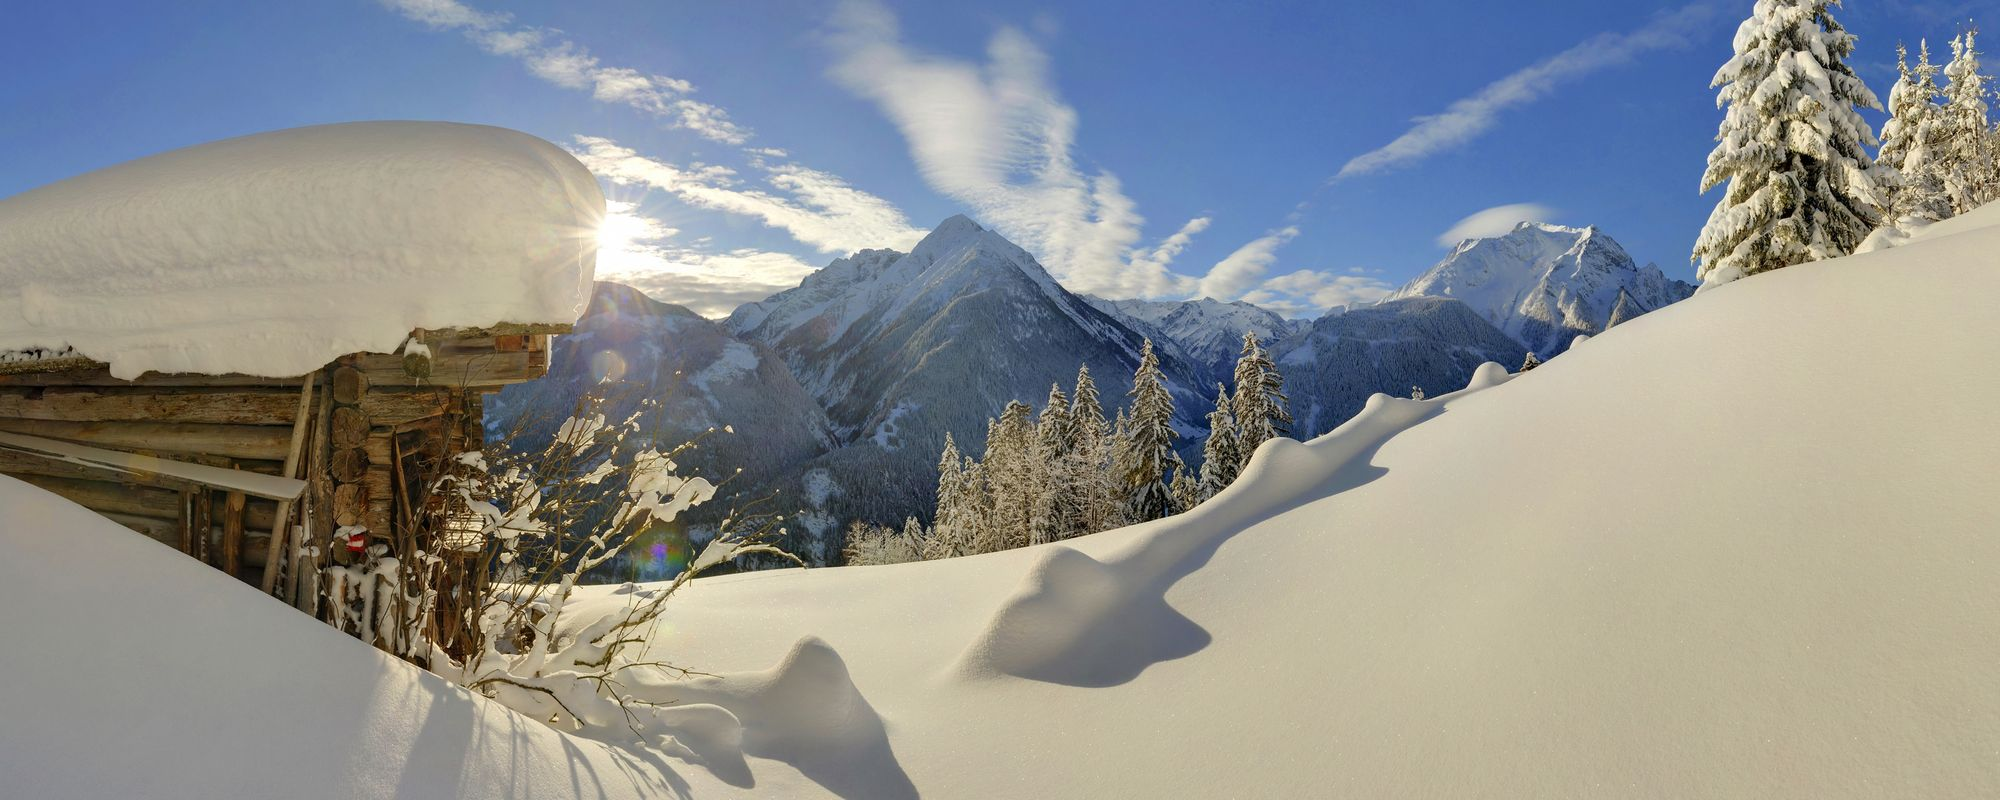 Zillertal - Archiv TVB Mayrhofen©Paul Sürth